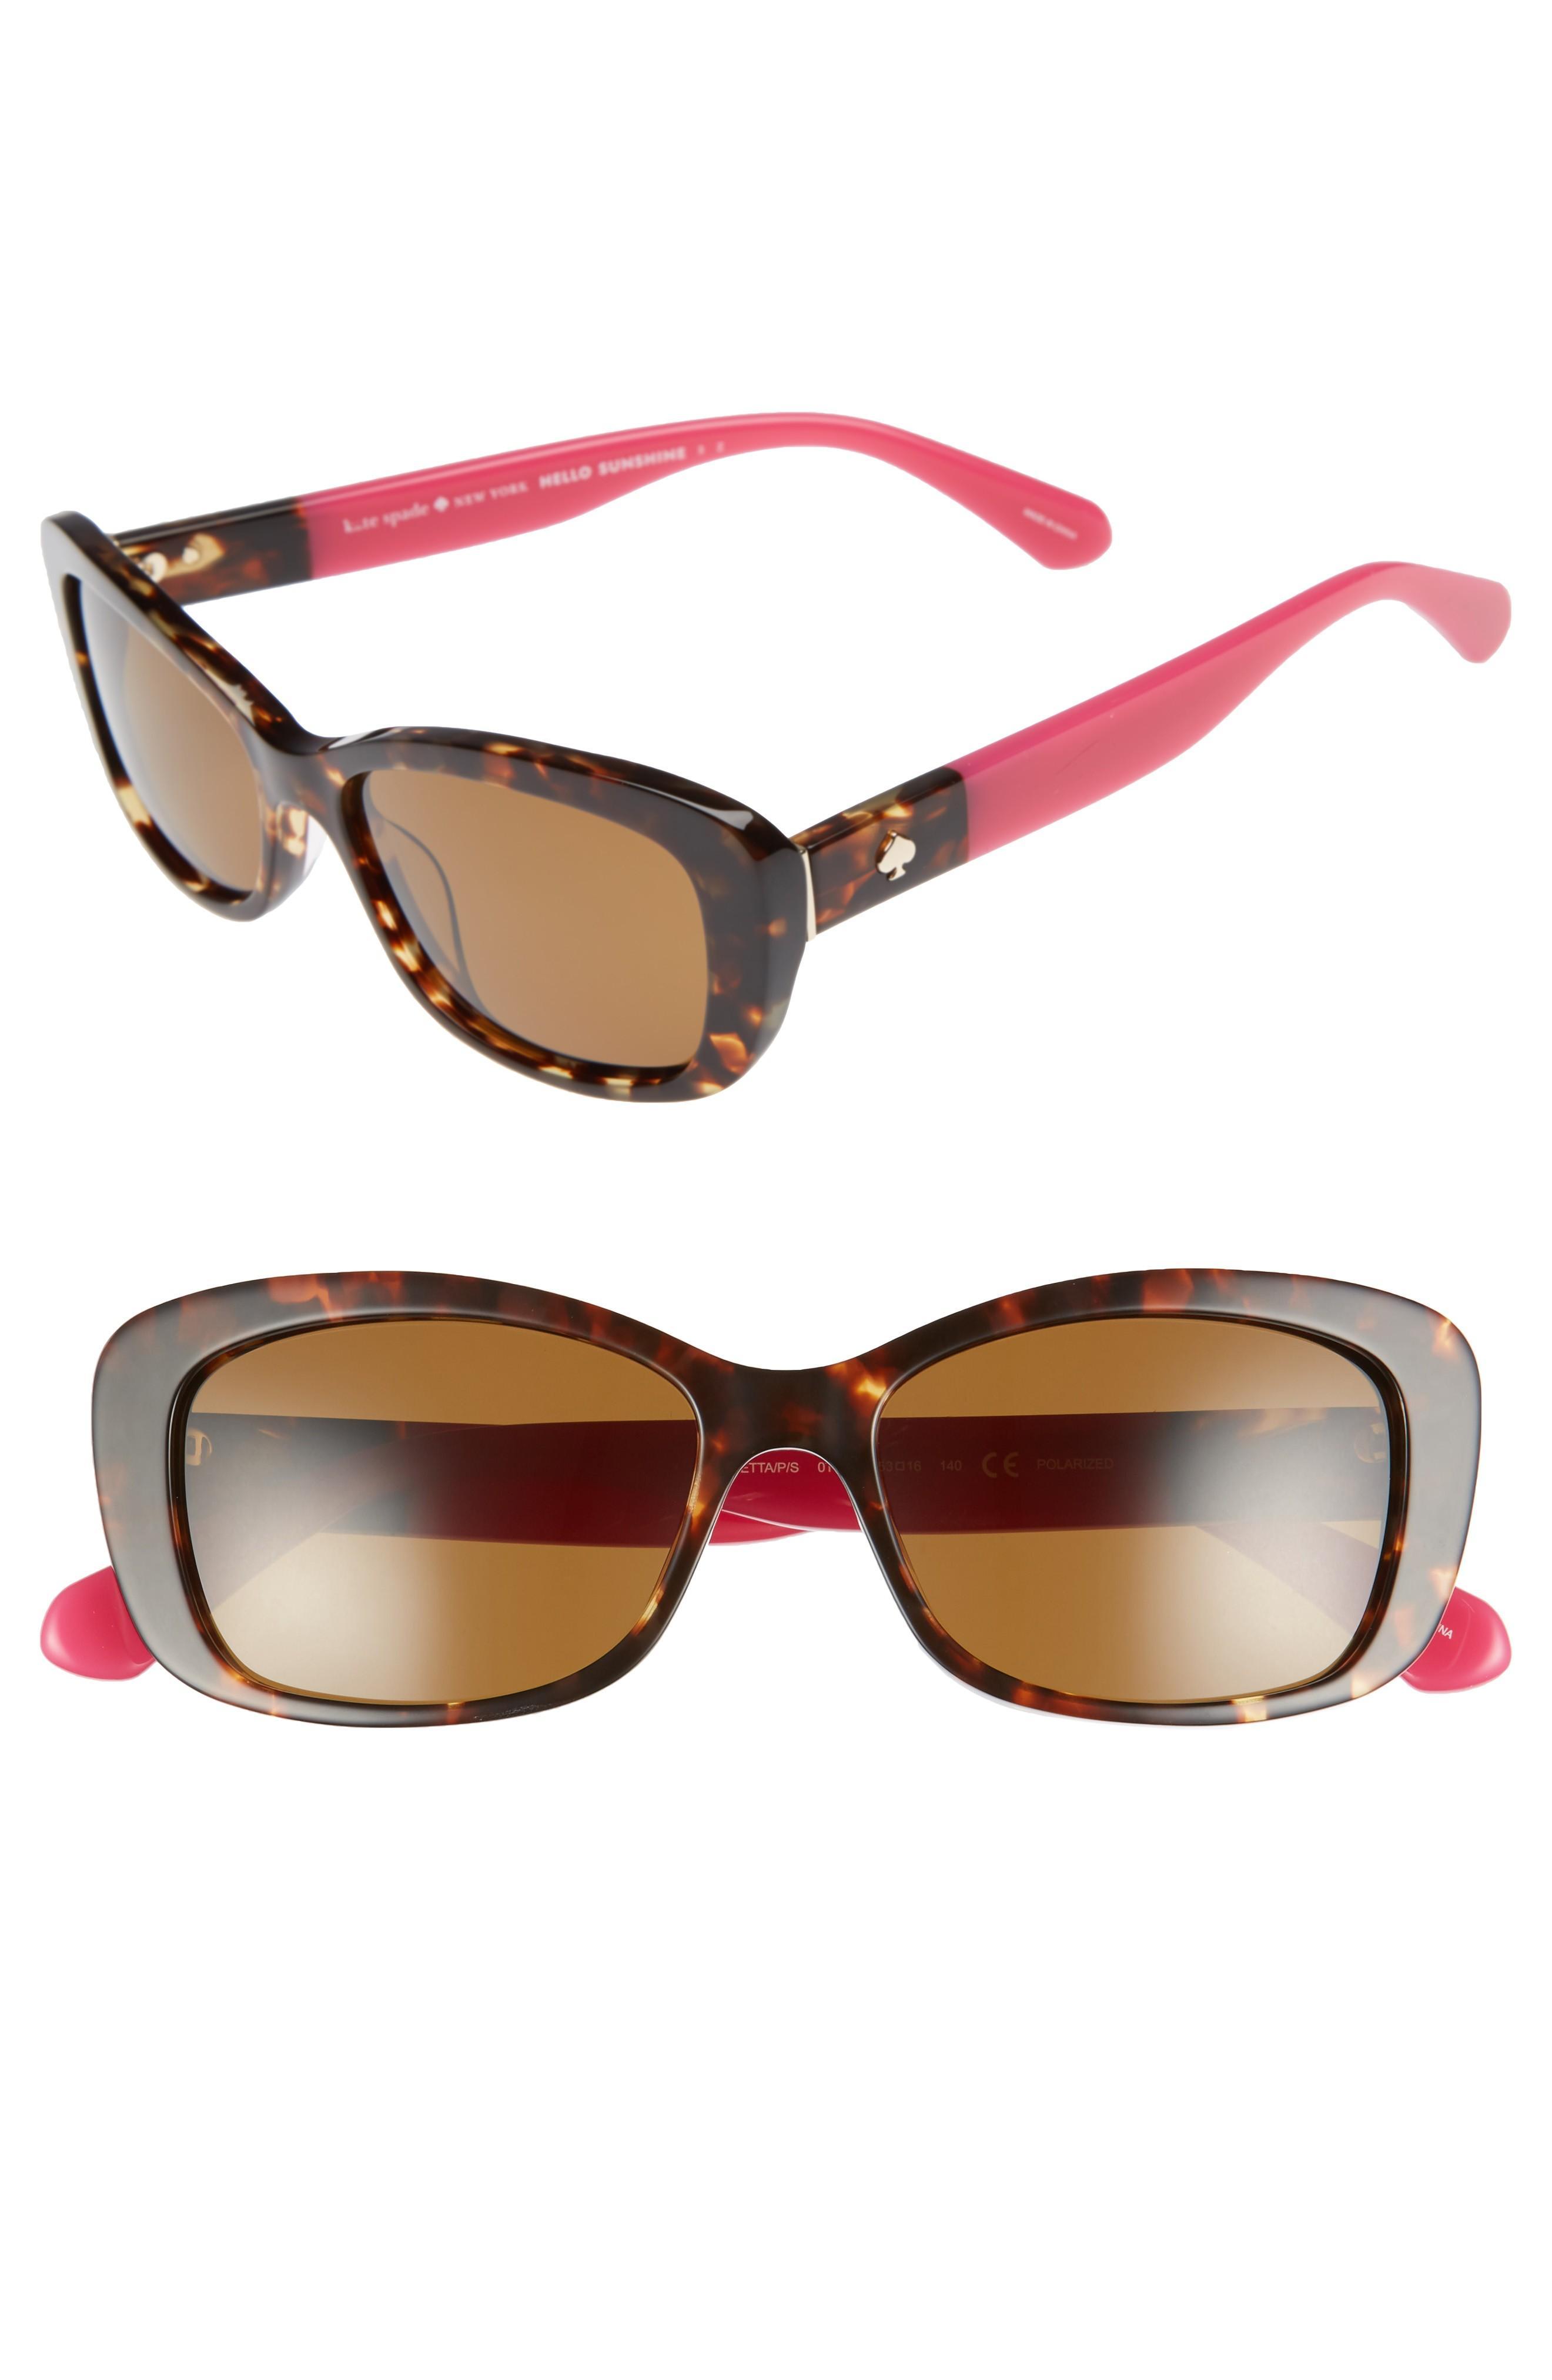 29ecd1610f85 Kate Spade Claretta 53Mm Polarized Sunglasses - Havana/ Pink   ModeSens